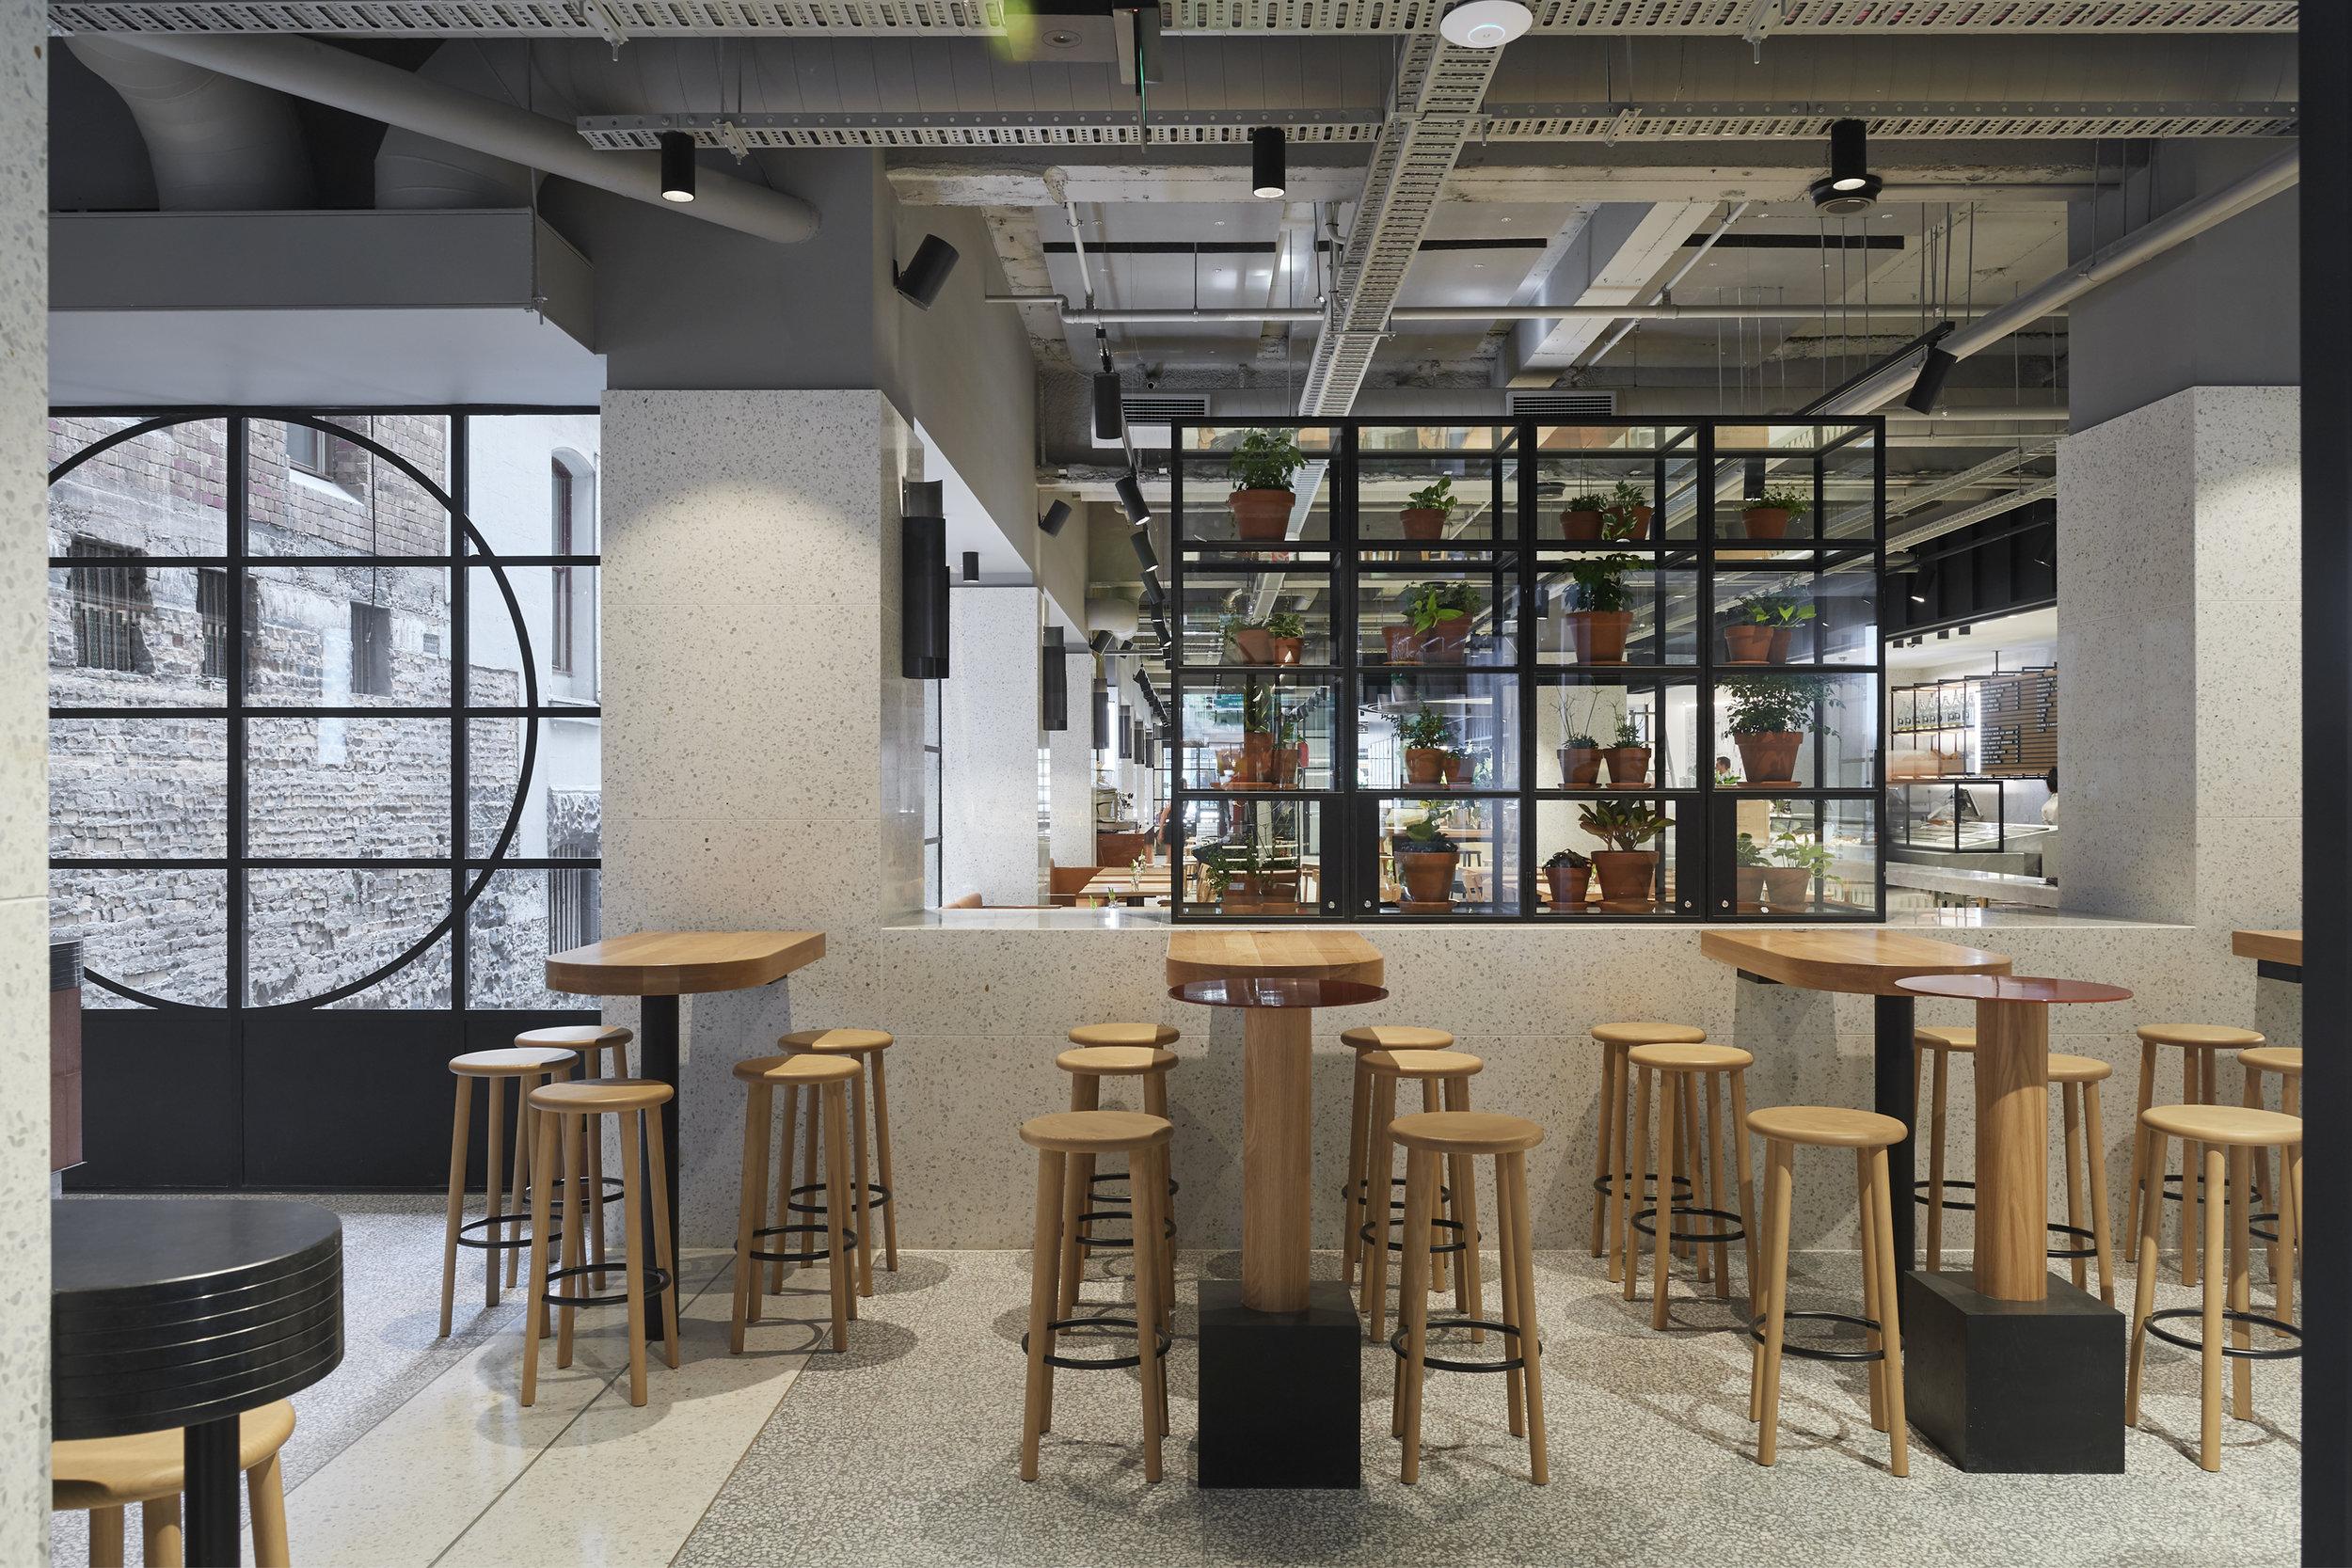 brunetti-opening-breakfast-2017-interior-4.jpg